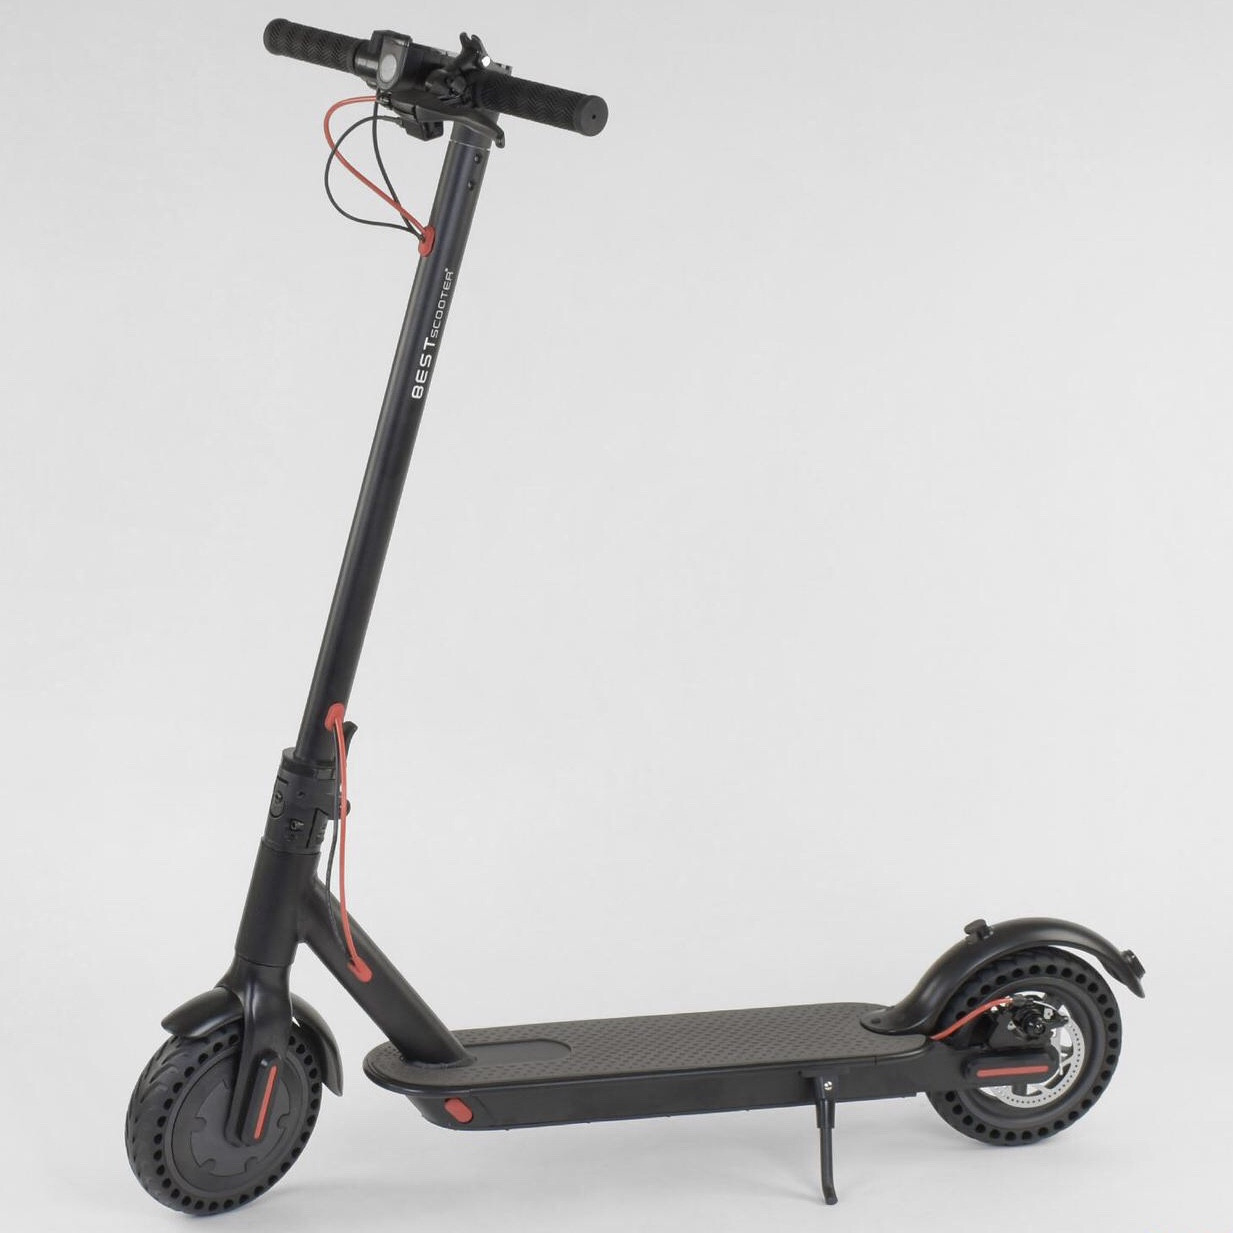 Електросамокат SD 3678 Best Scooter колеса 8,5 колір Чорний